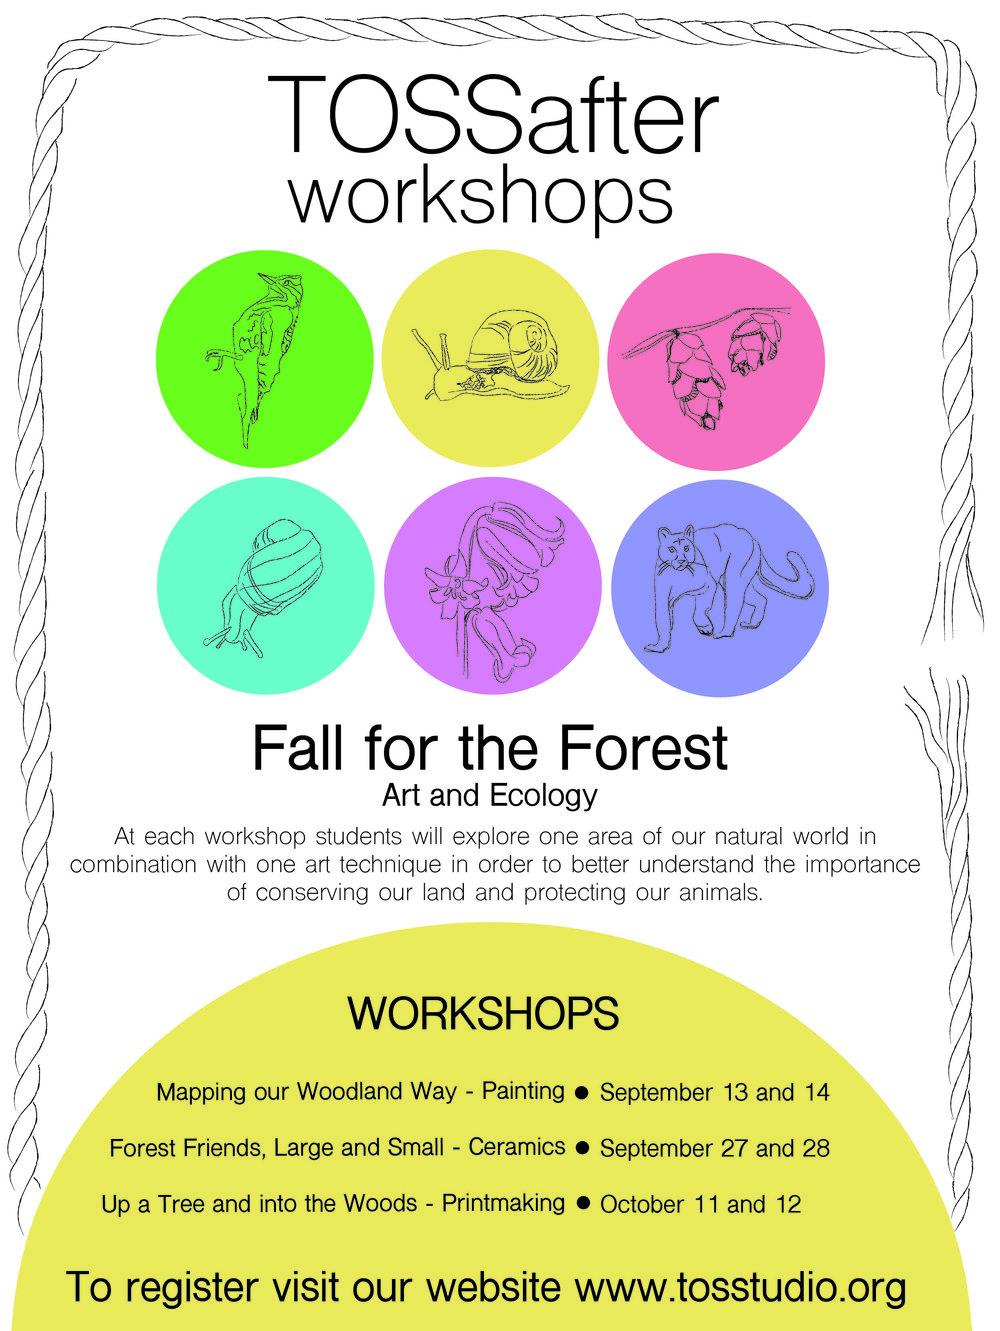 FallfortheForestWorkshops.jpg